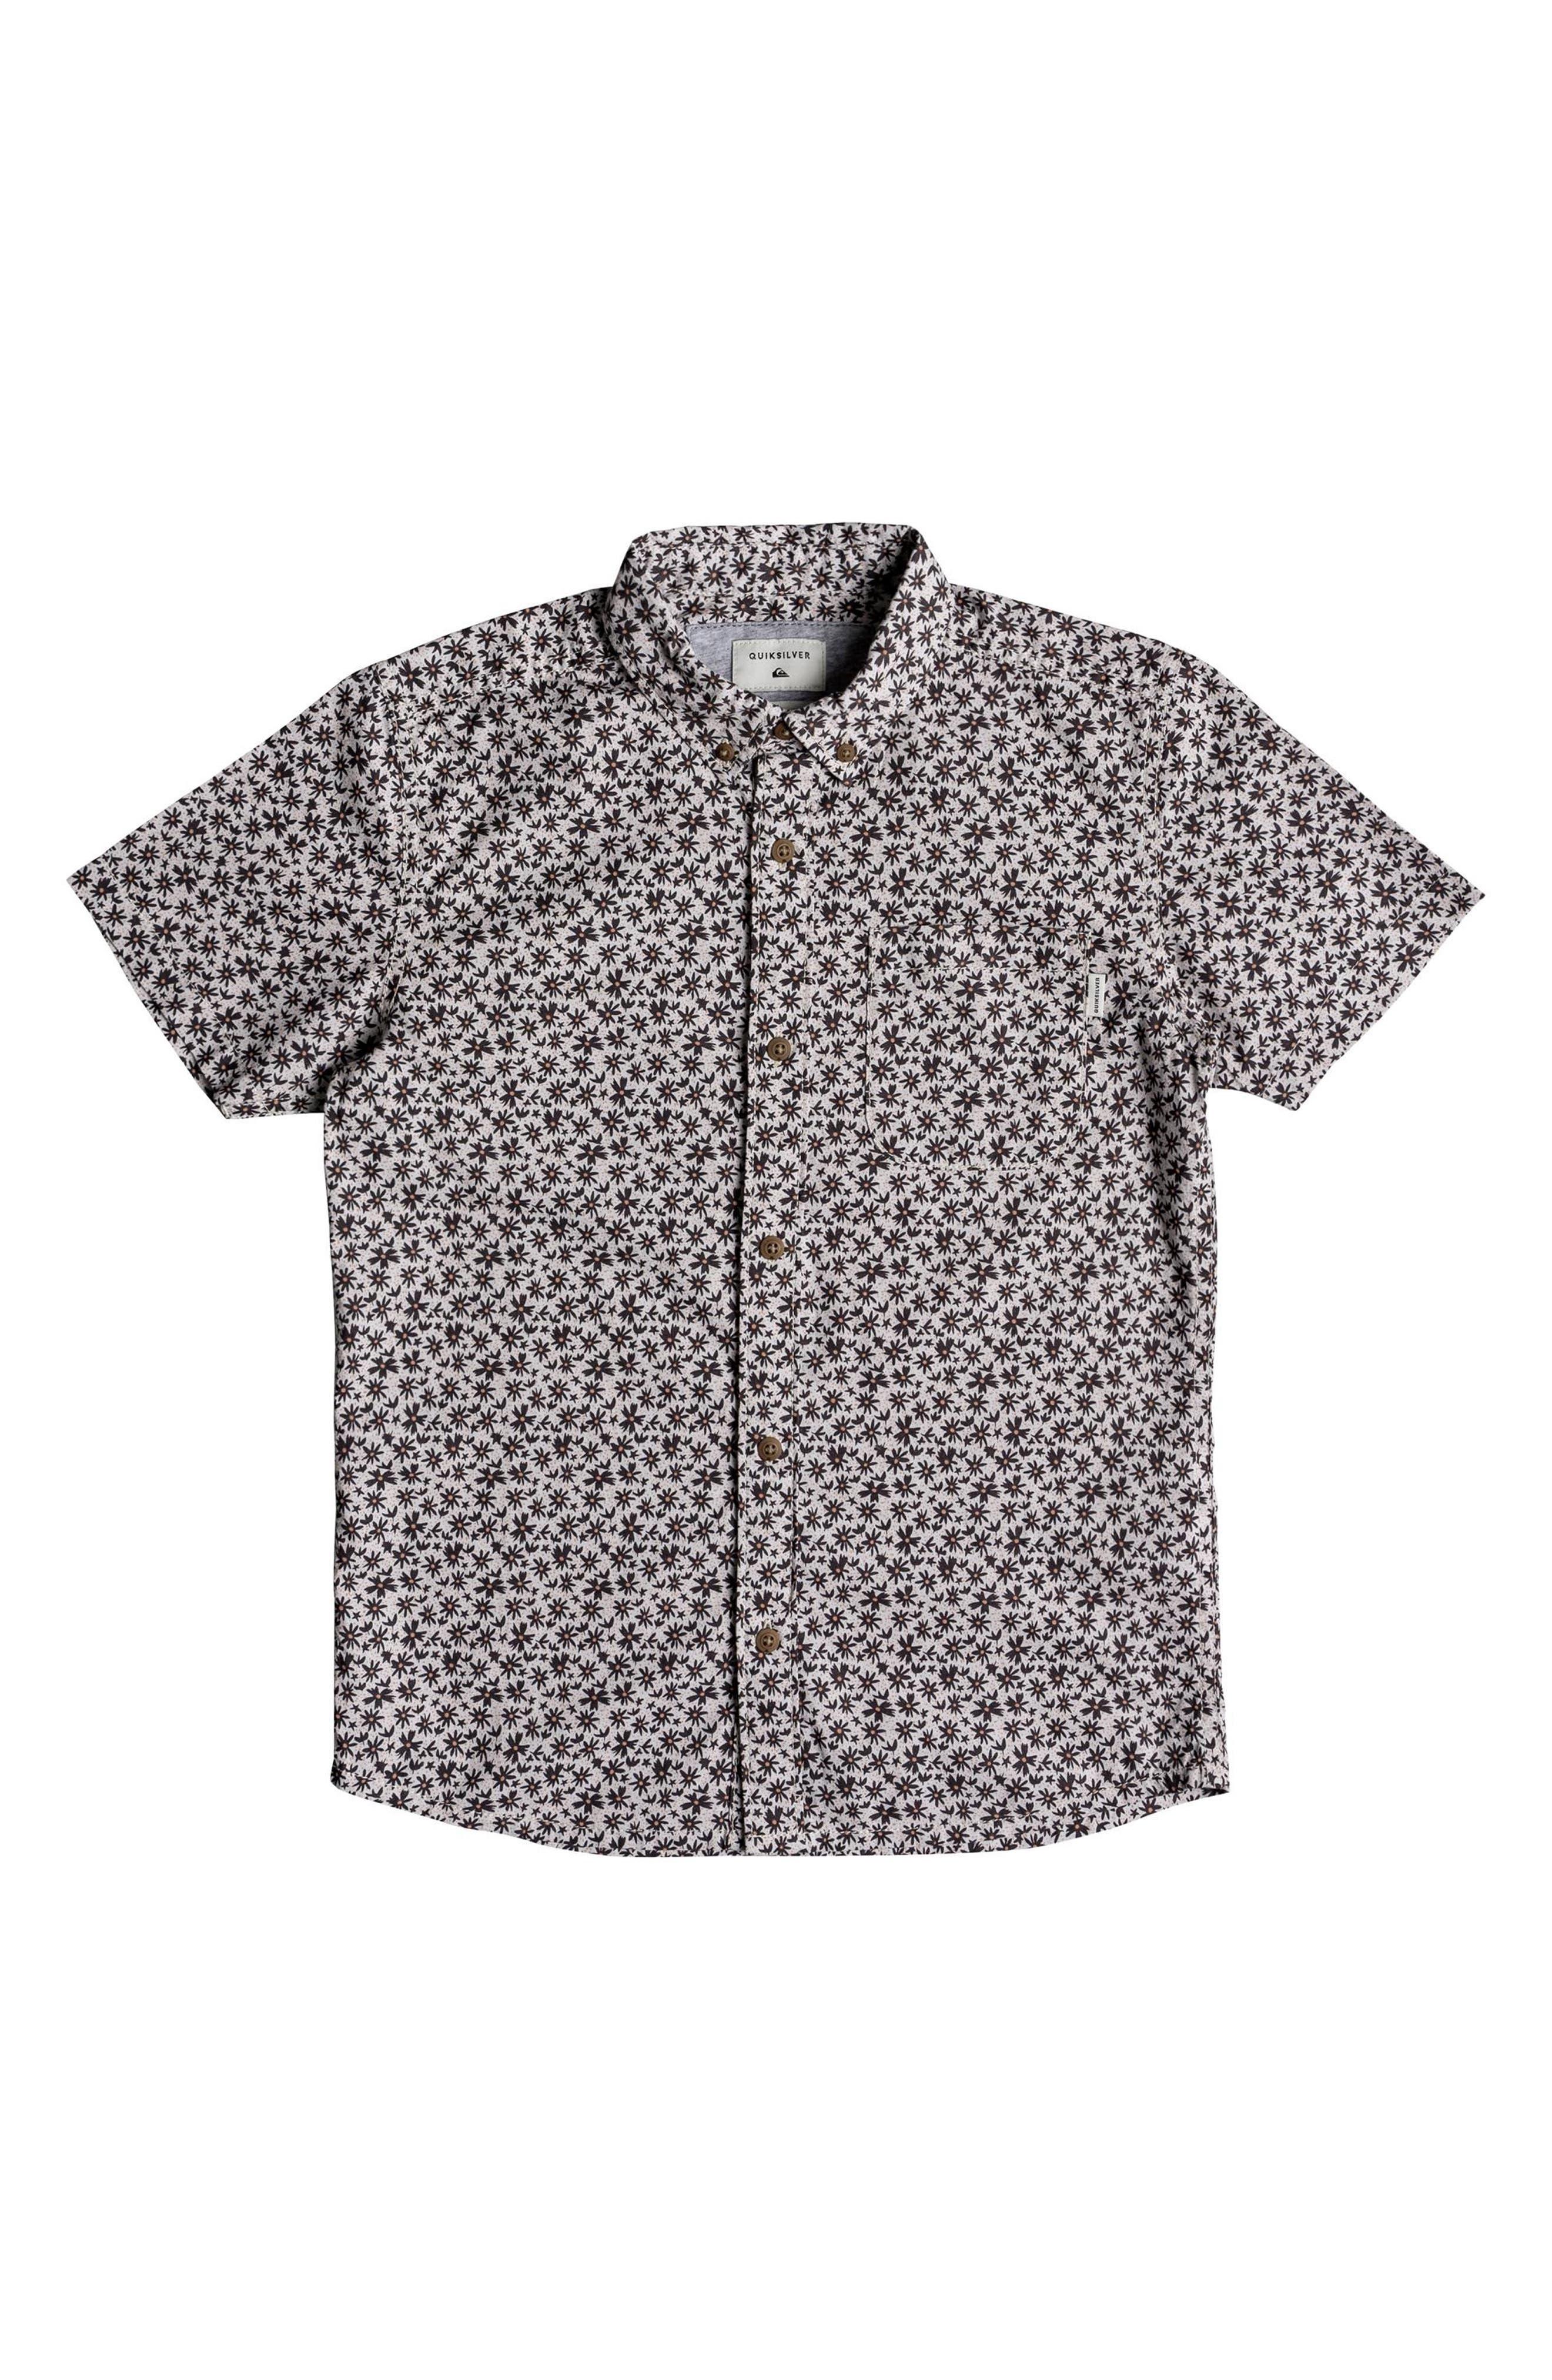 Quiksilver Minikani Woven Shirt (Big Boys)